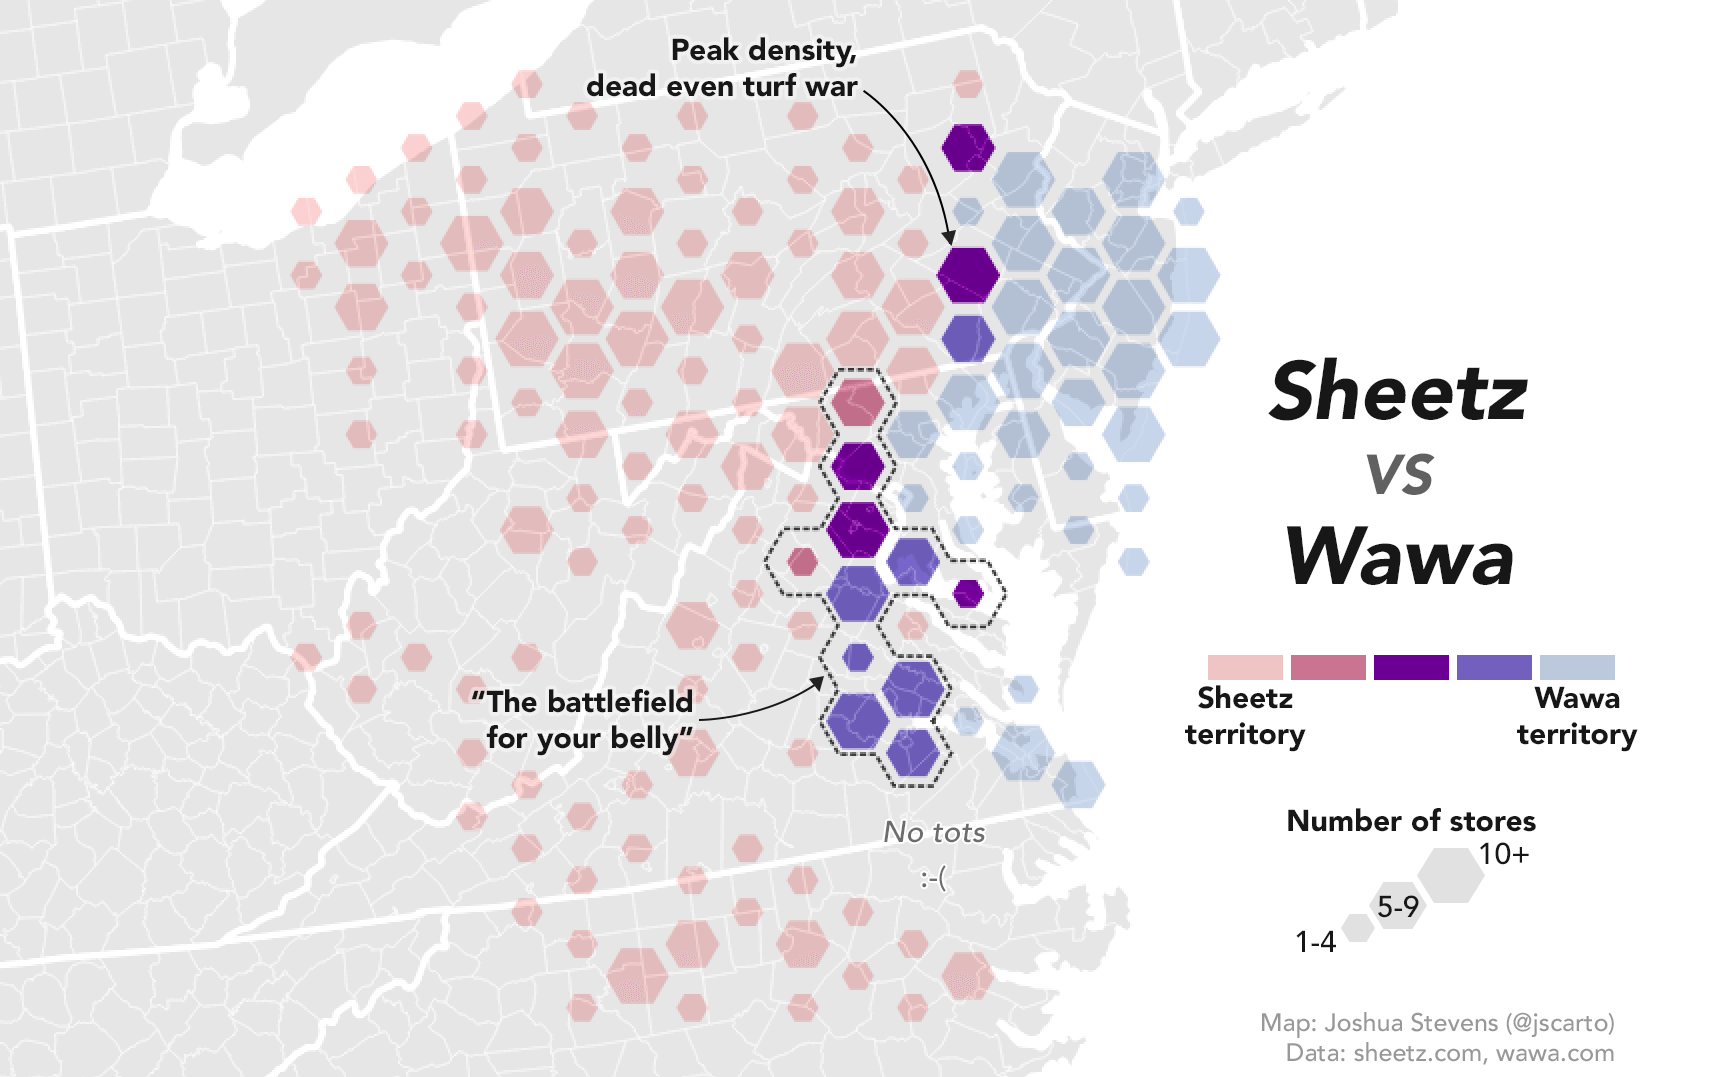 NASA Cartographer Weighs in on Wawa/Sheetz Turf War With a Twitter Store Map